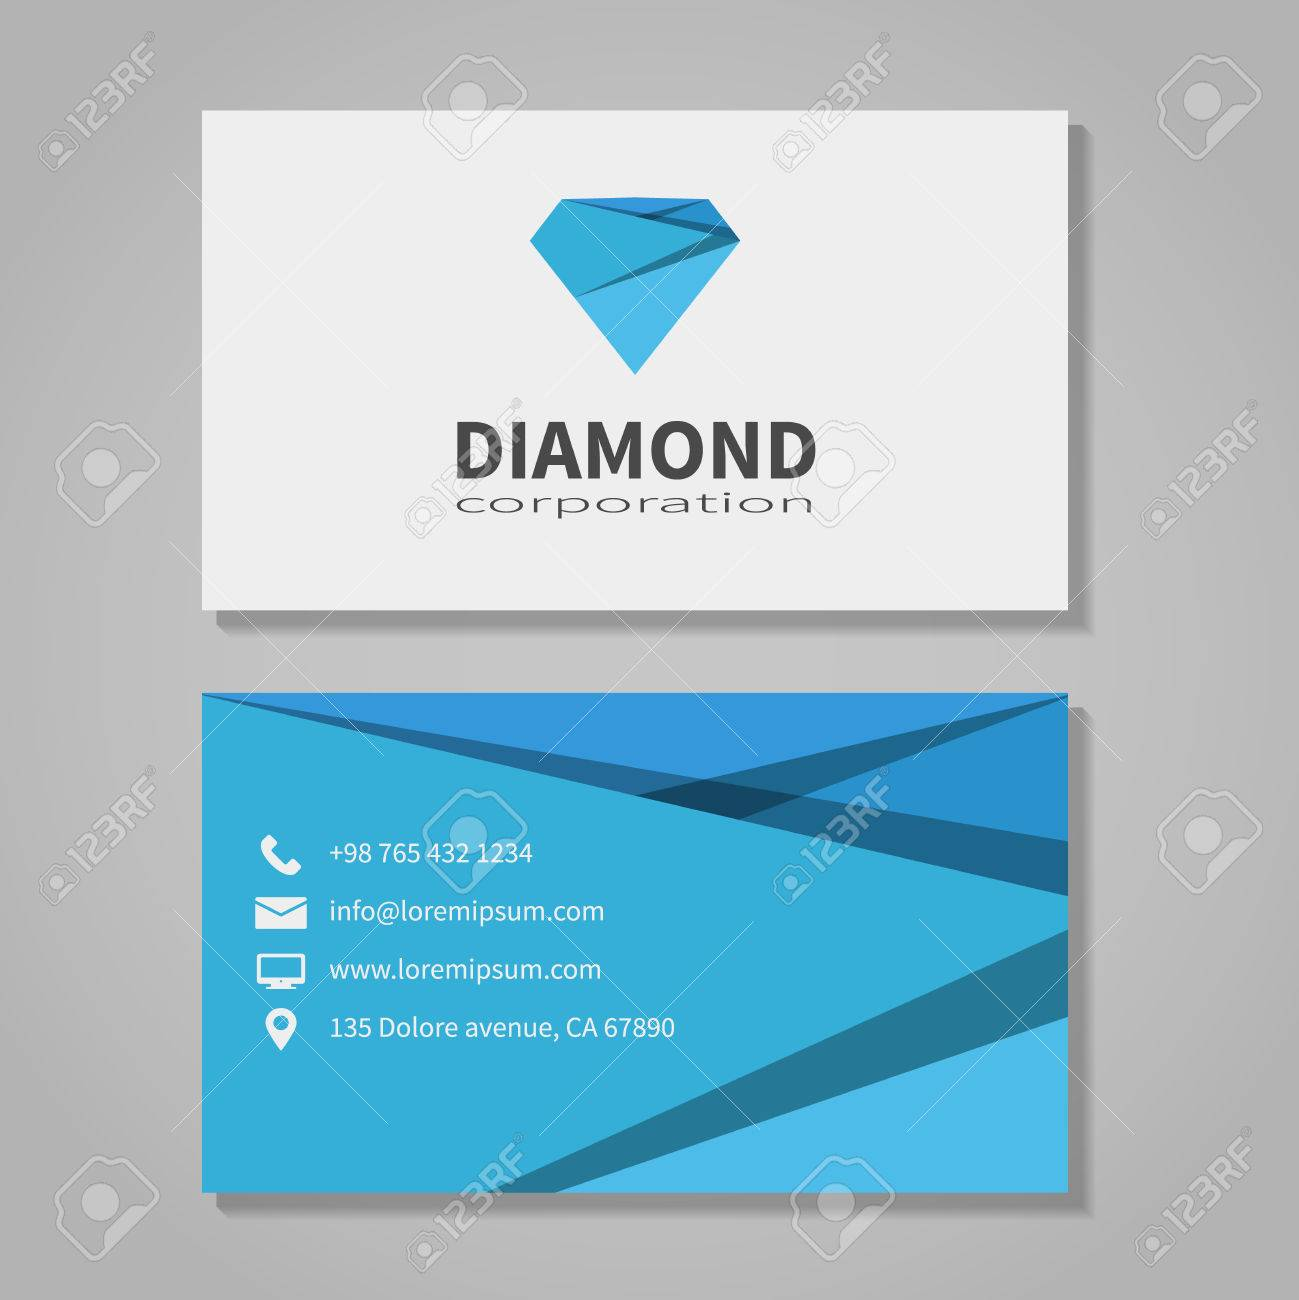 Diamond corporation business card template royalty free cliparts diamond corporation business card template stock vector 37844600 colourmoves